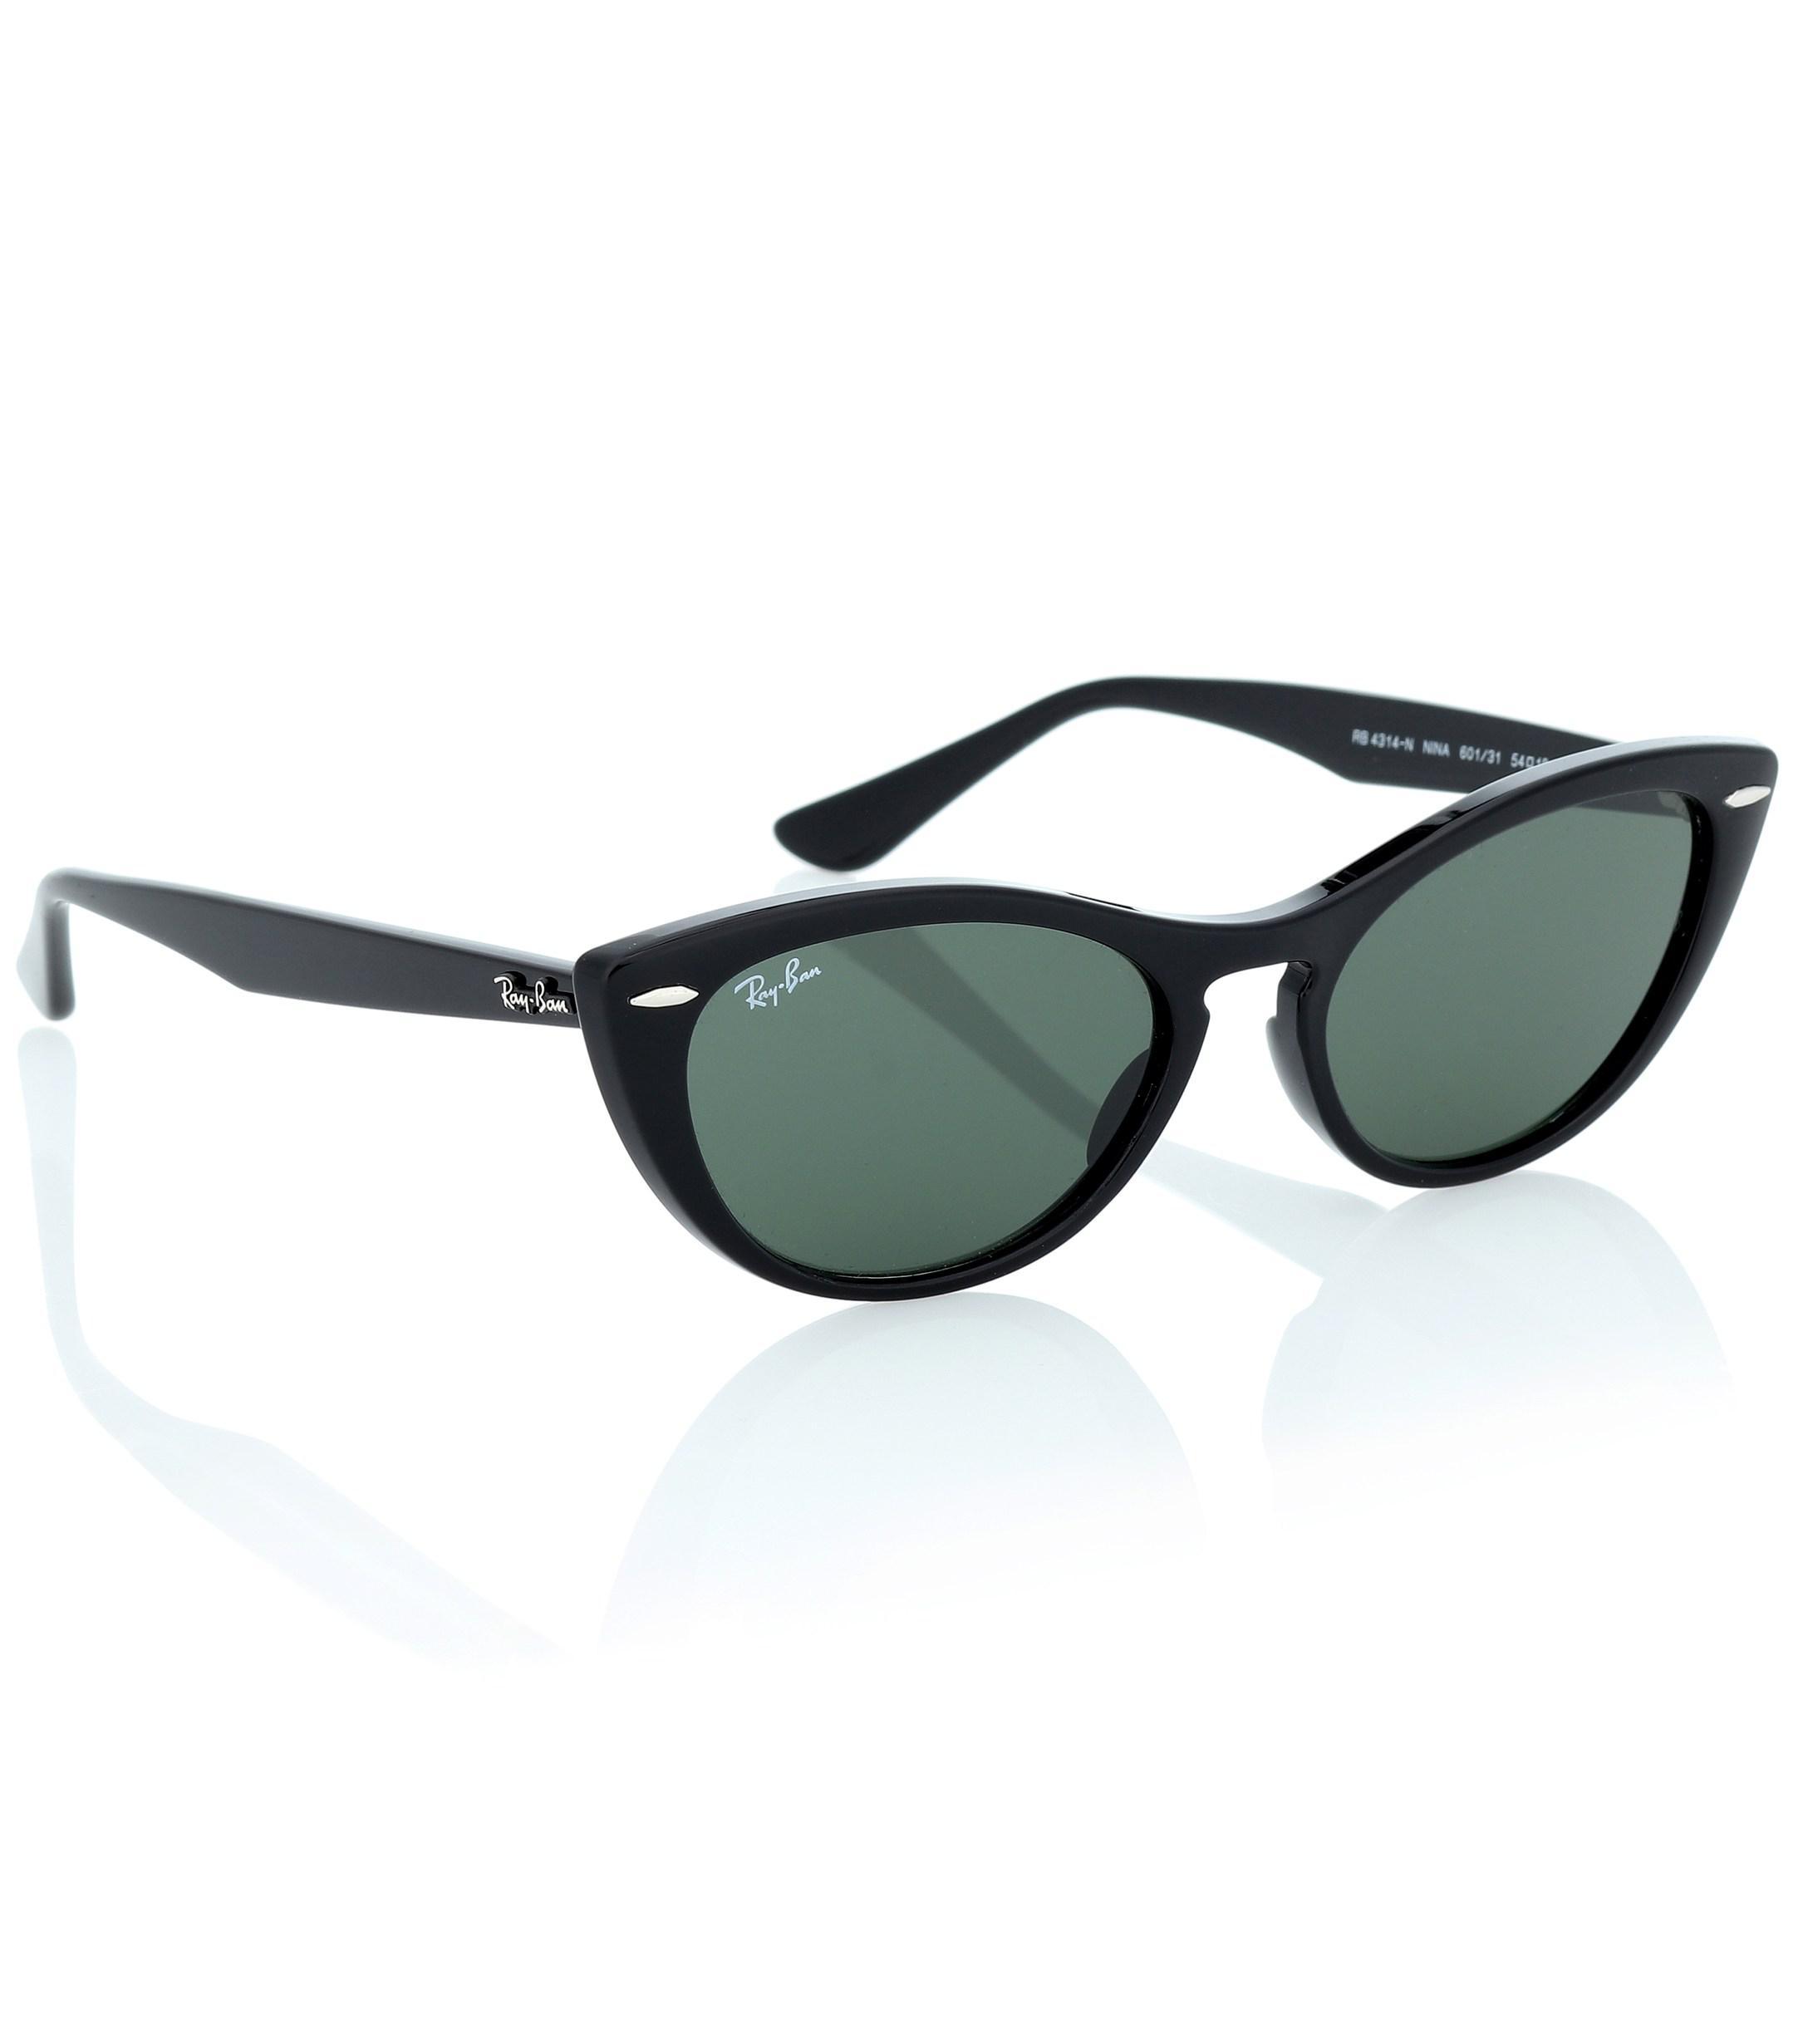 d6e583e8a5 Ray-Ban - Black Nina Cat-eye Acetate Sunglasses - Lyst. View fullscreen